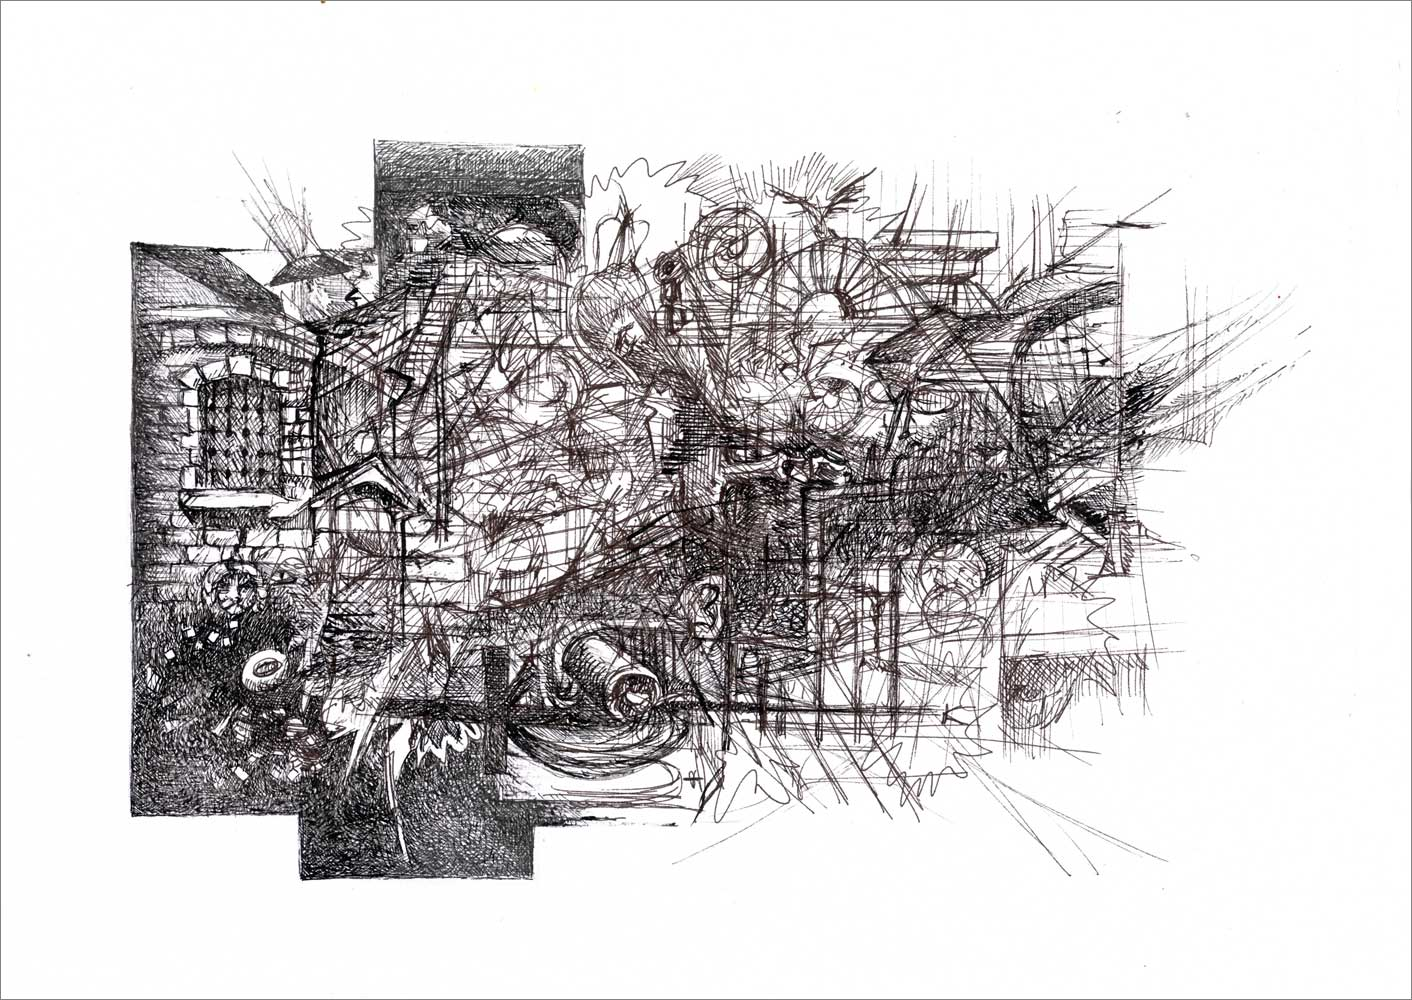 Henri Blanc dessins à la plume - Gomorra episode_10 ink drawing